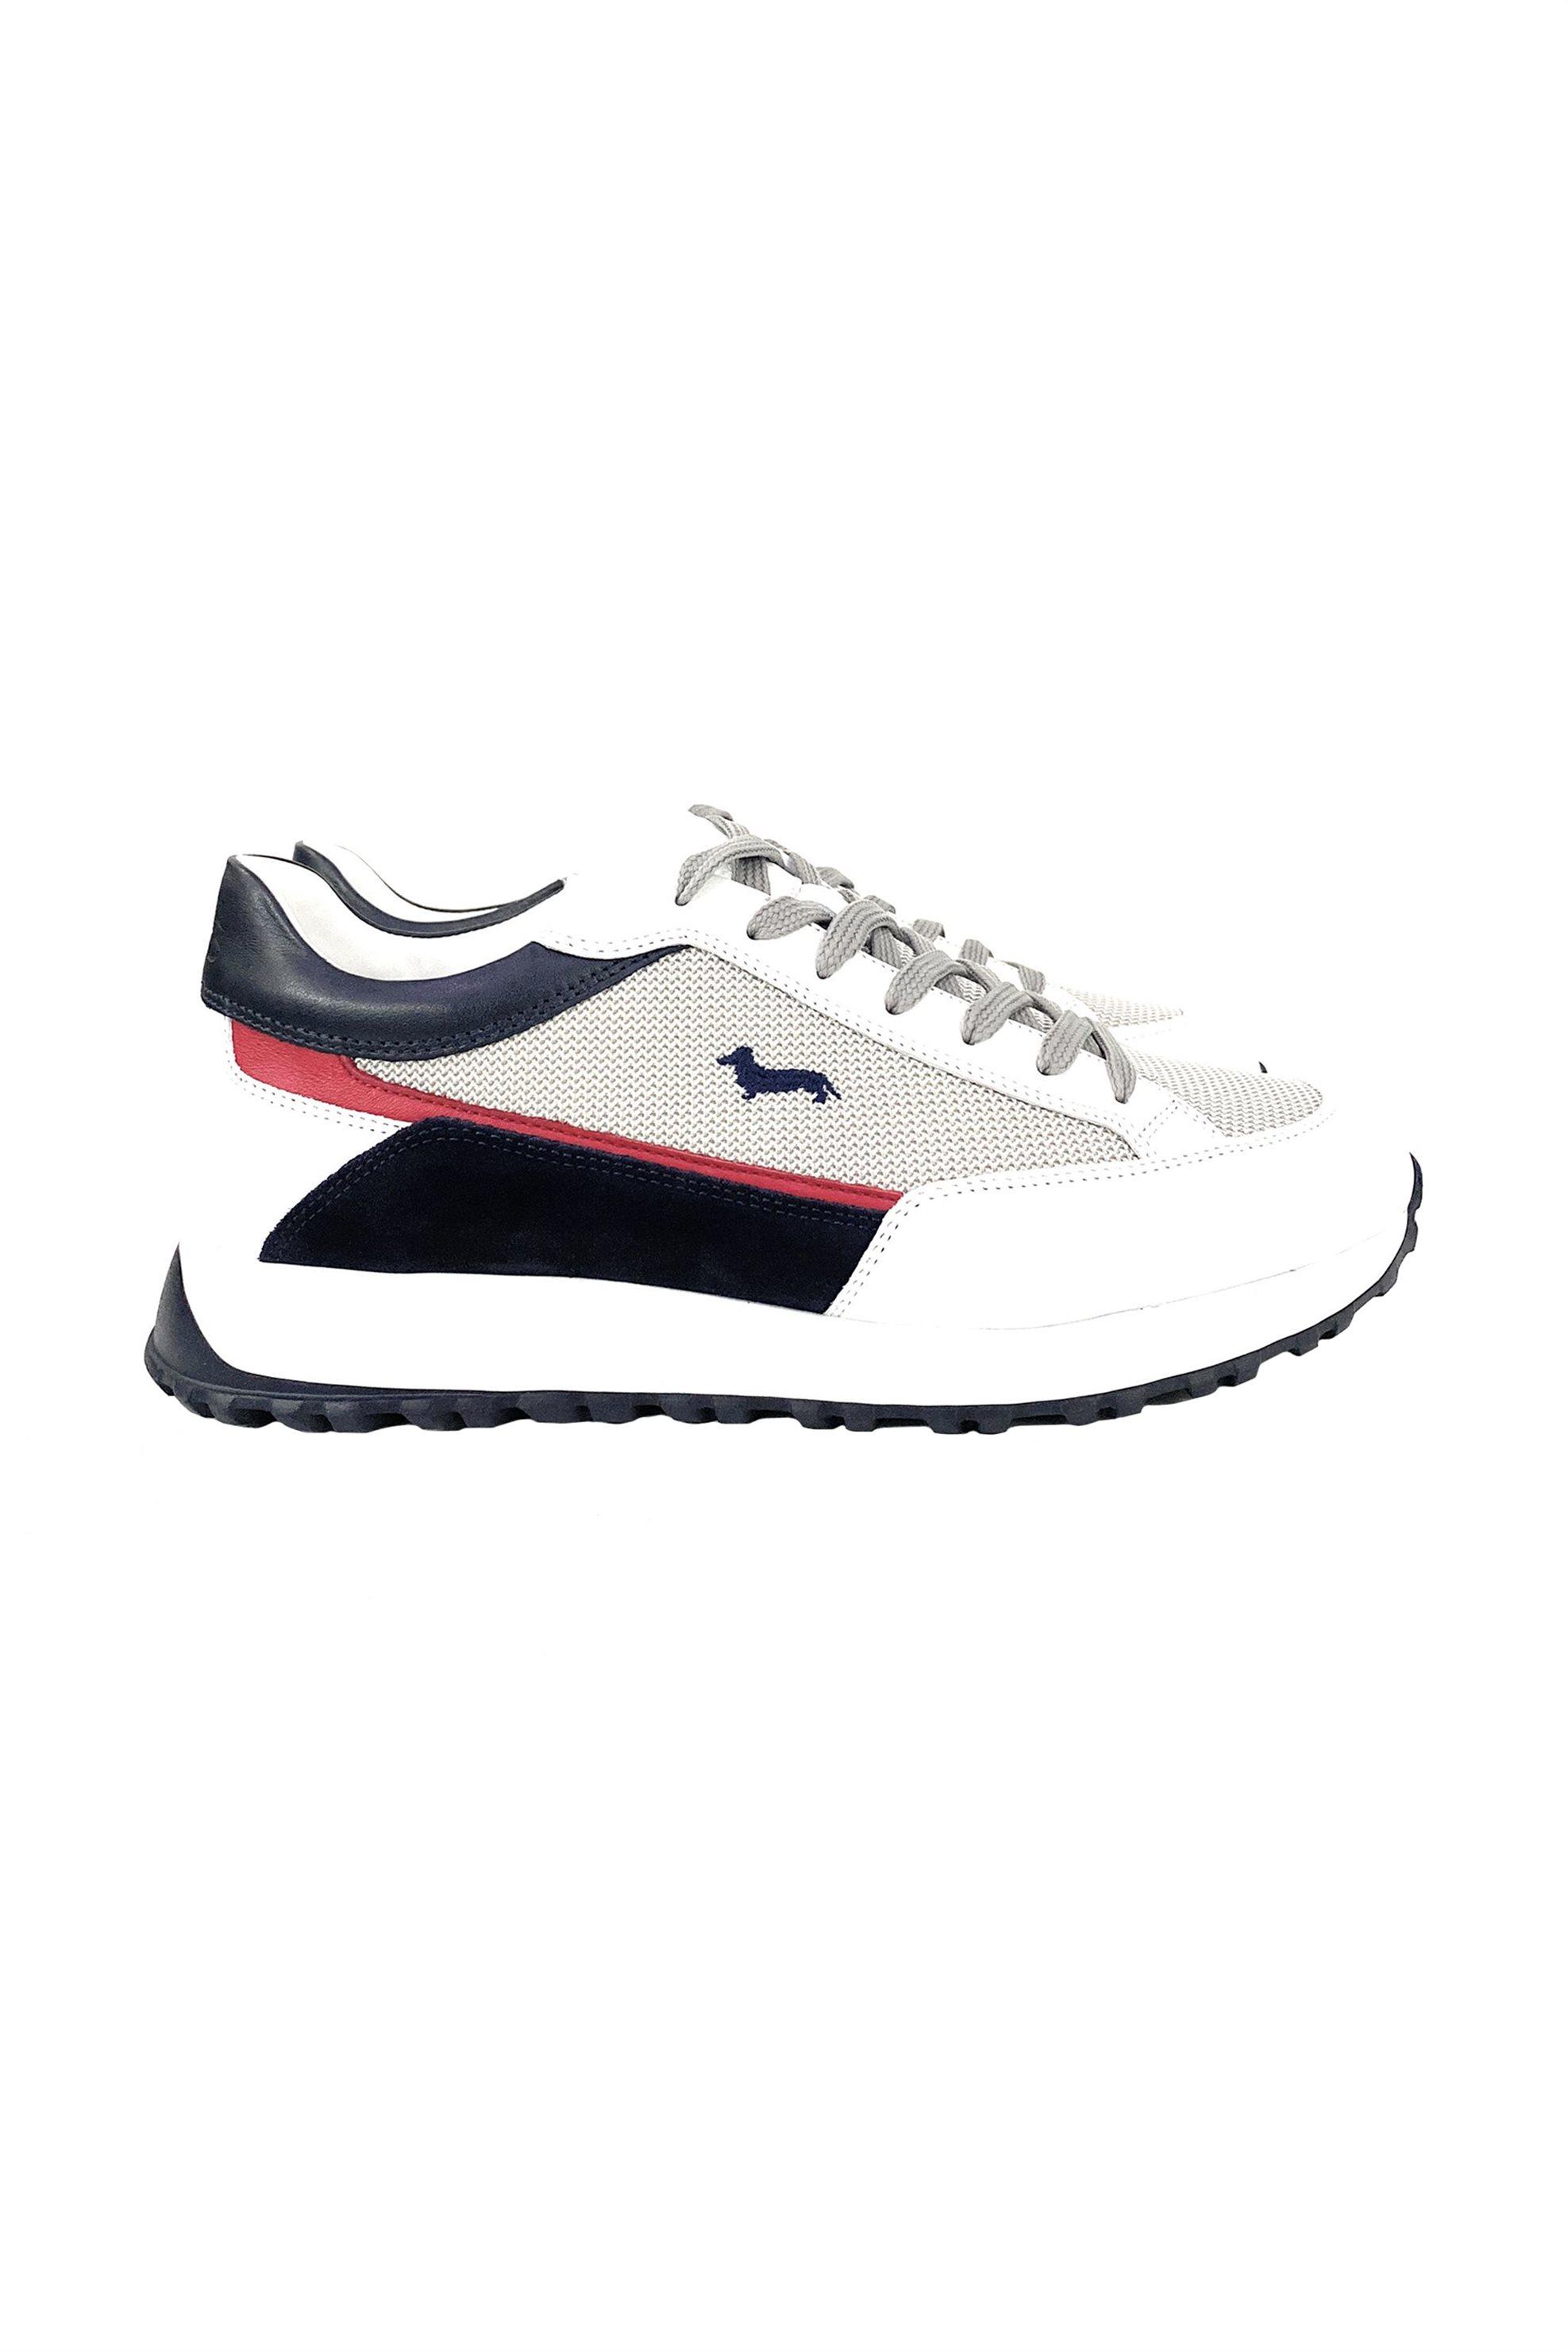 Harmont & Blaine ανδρικά sneakers με suede λεπτομέρειες και κεντημένο logo – EFM211050-6080 – Άσπρο